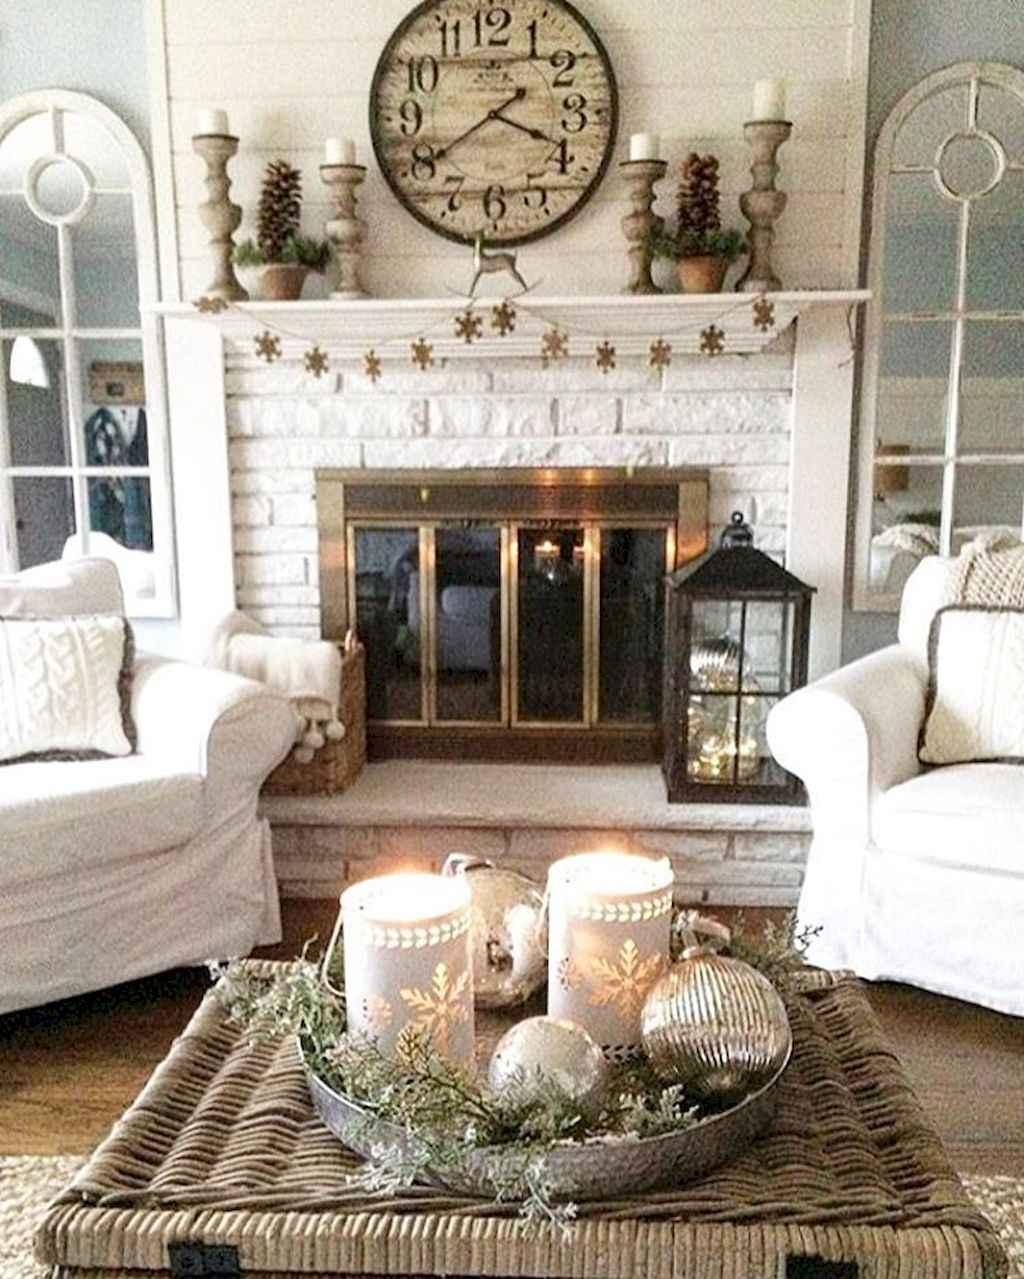 Simple clean vintage living room decorating ideas (9)